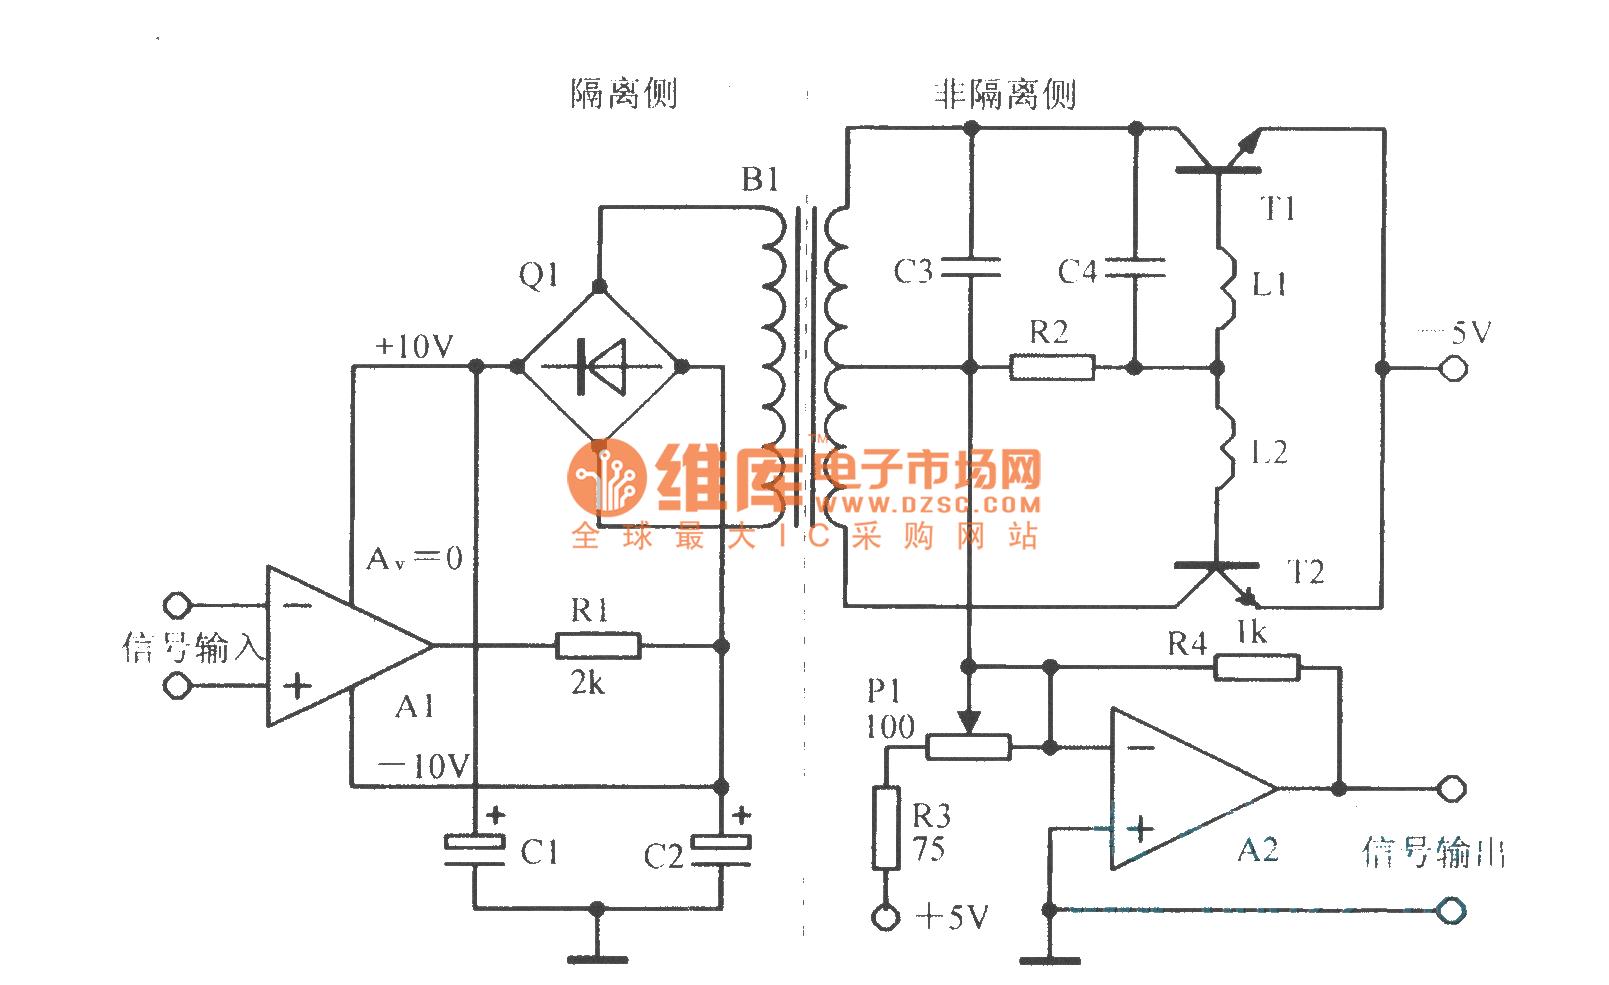 Index 3 Time Control Control Circuit Circuit Diagram Seekic